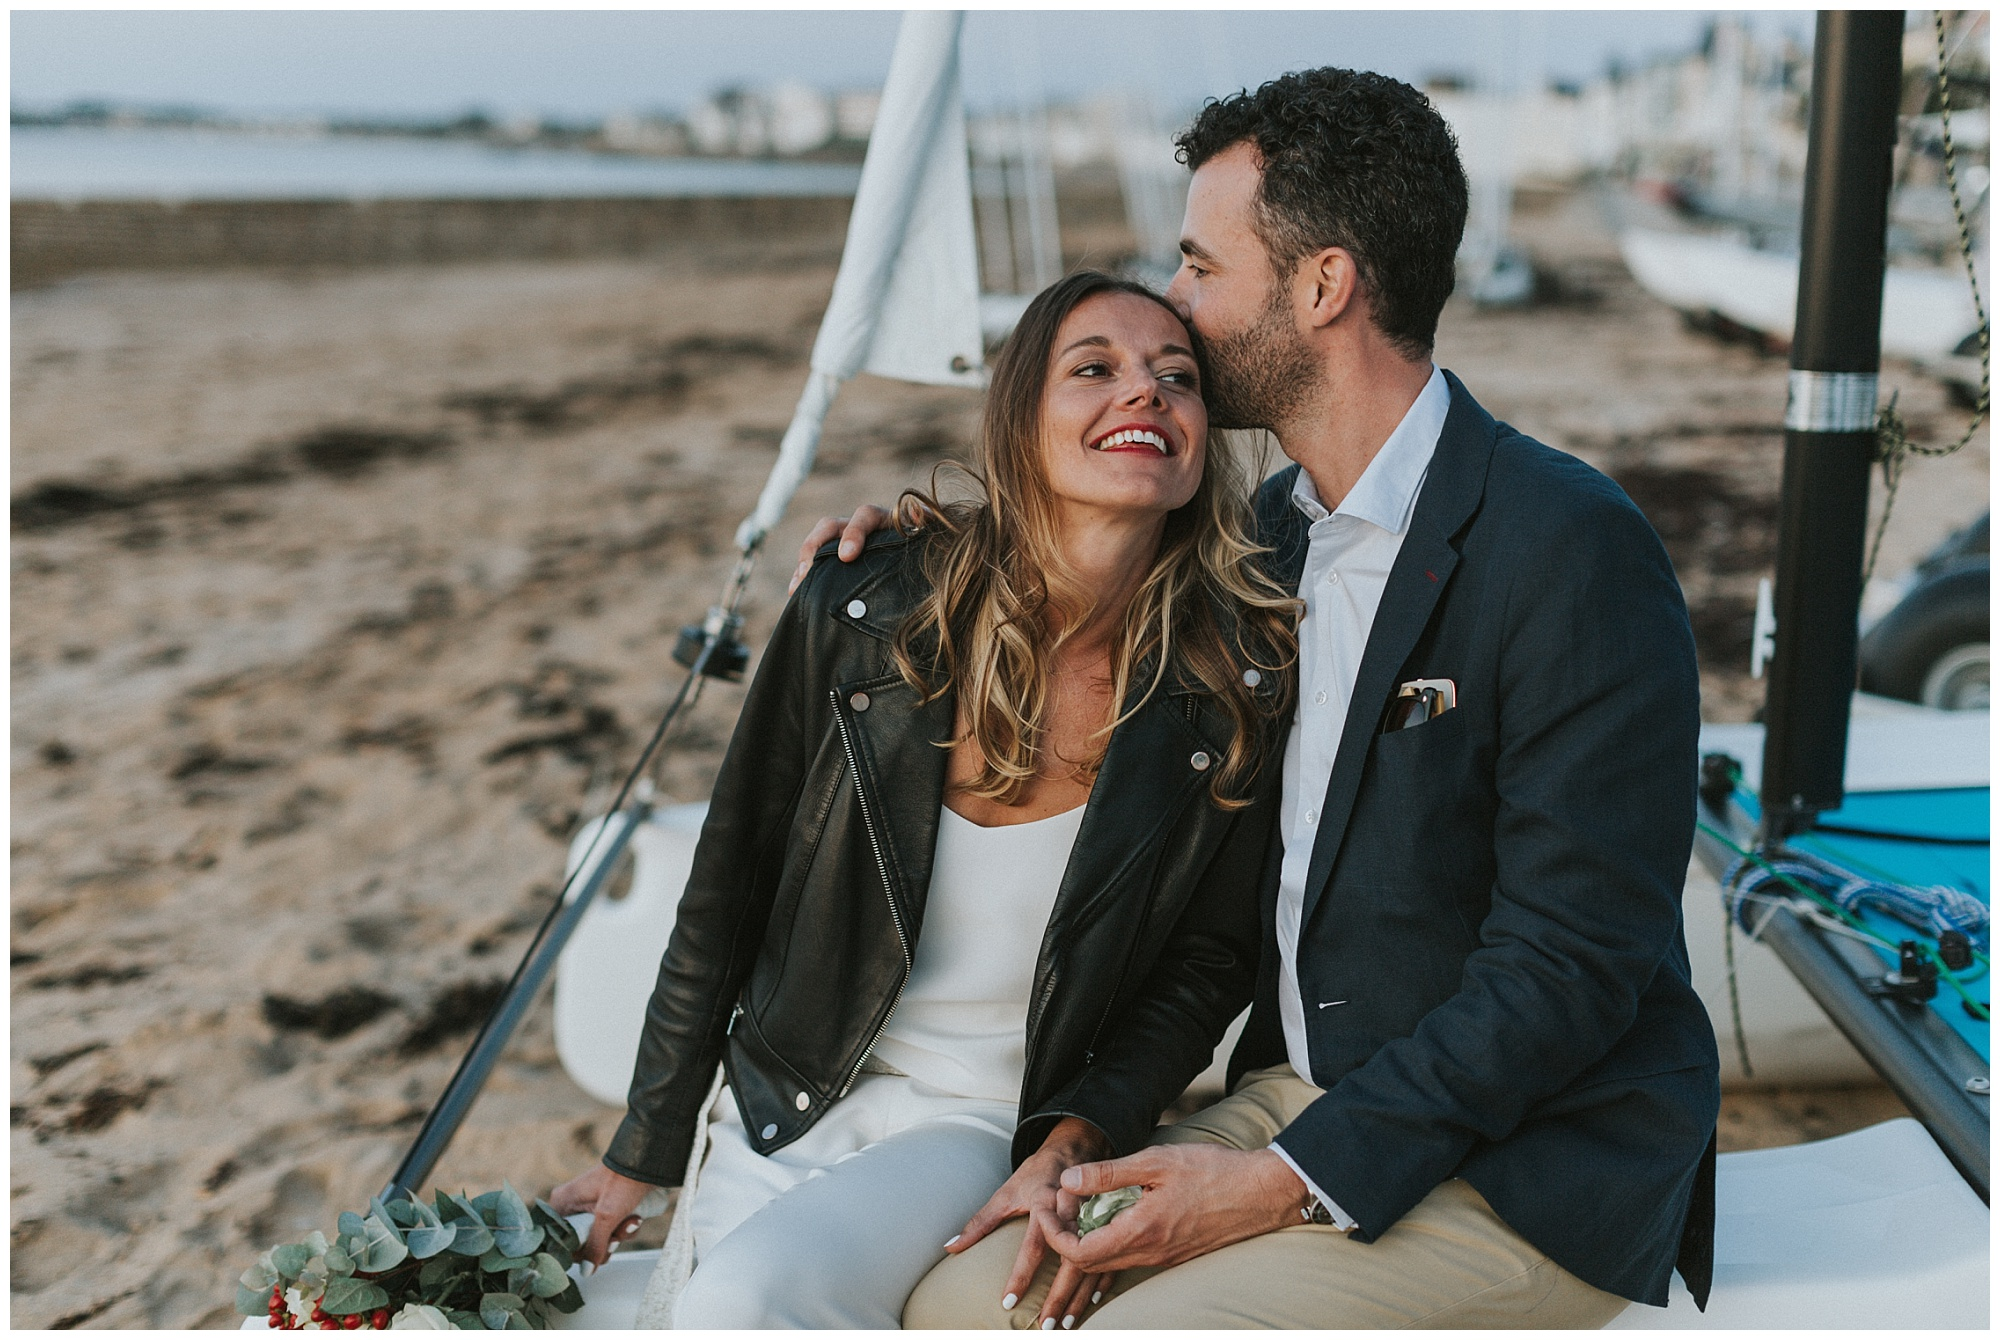 Kateryna-photos-photographe-mariage-bretagne-saint-malo-finistere-cotes-darmor-wedding_0093.jpg